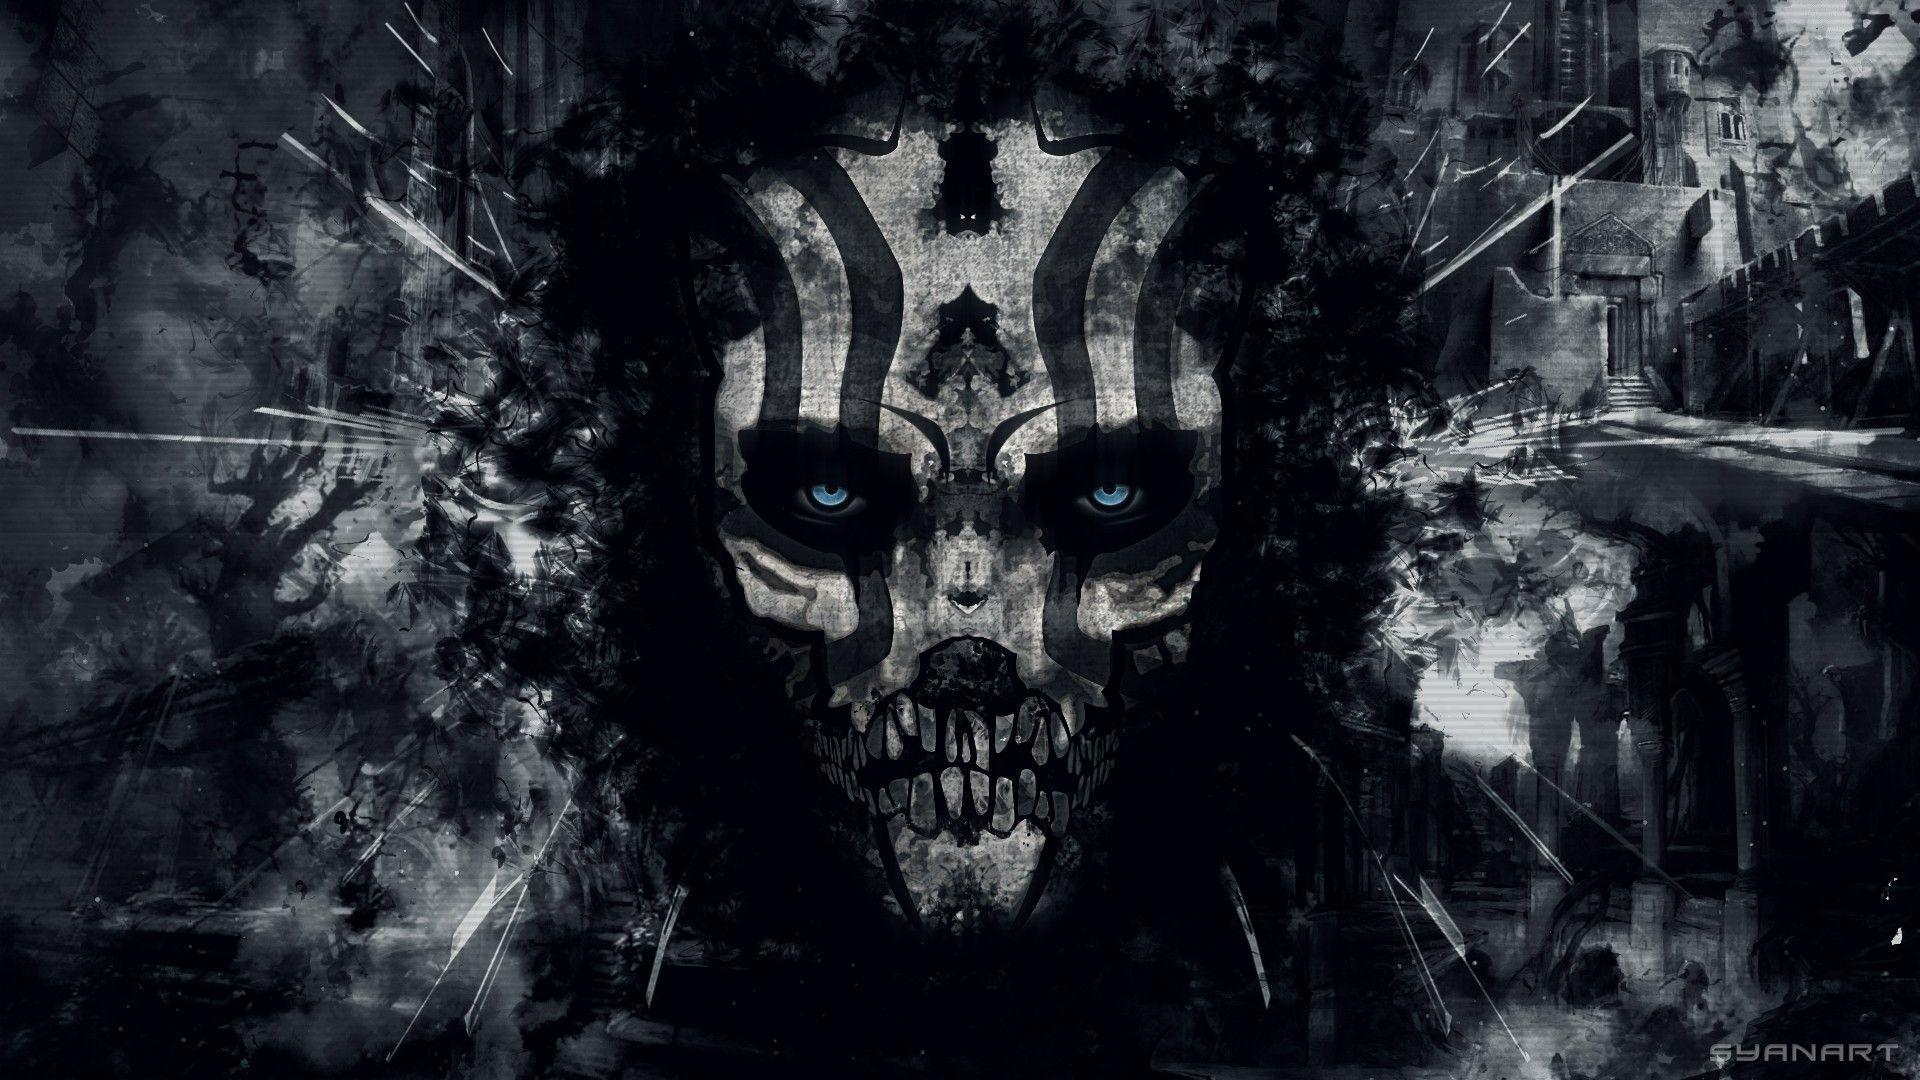 Dark Evil Skull Wallpapers   Top Dark Evil Skull Backgrounds 1920x1080